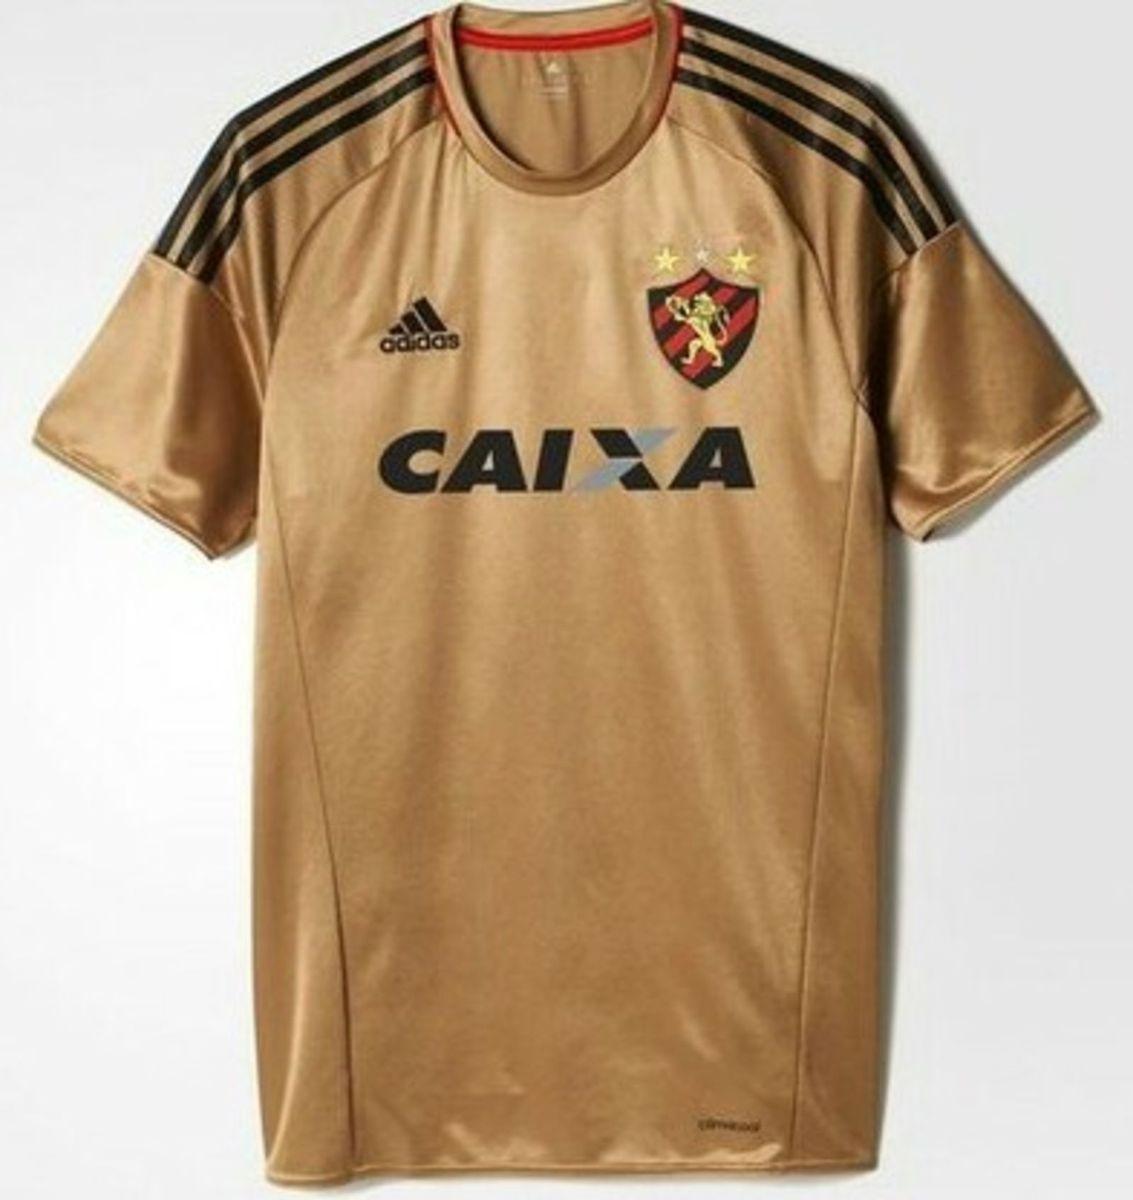 b579502bbe617 camisa sport recife dourafa of 3 - adidas - camisas adidas